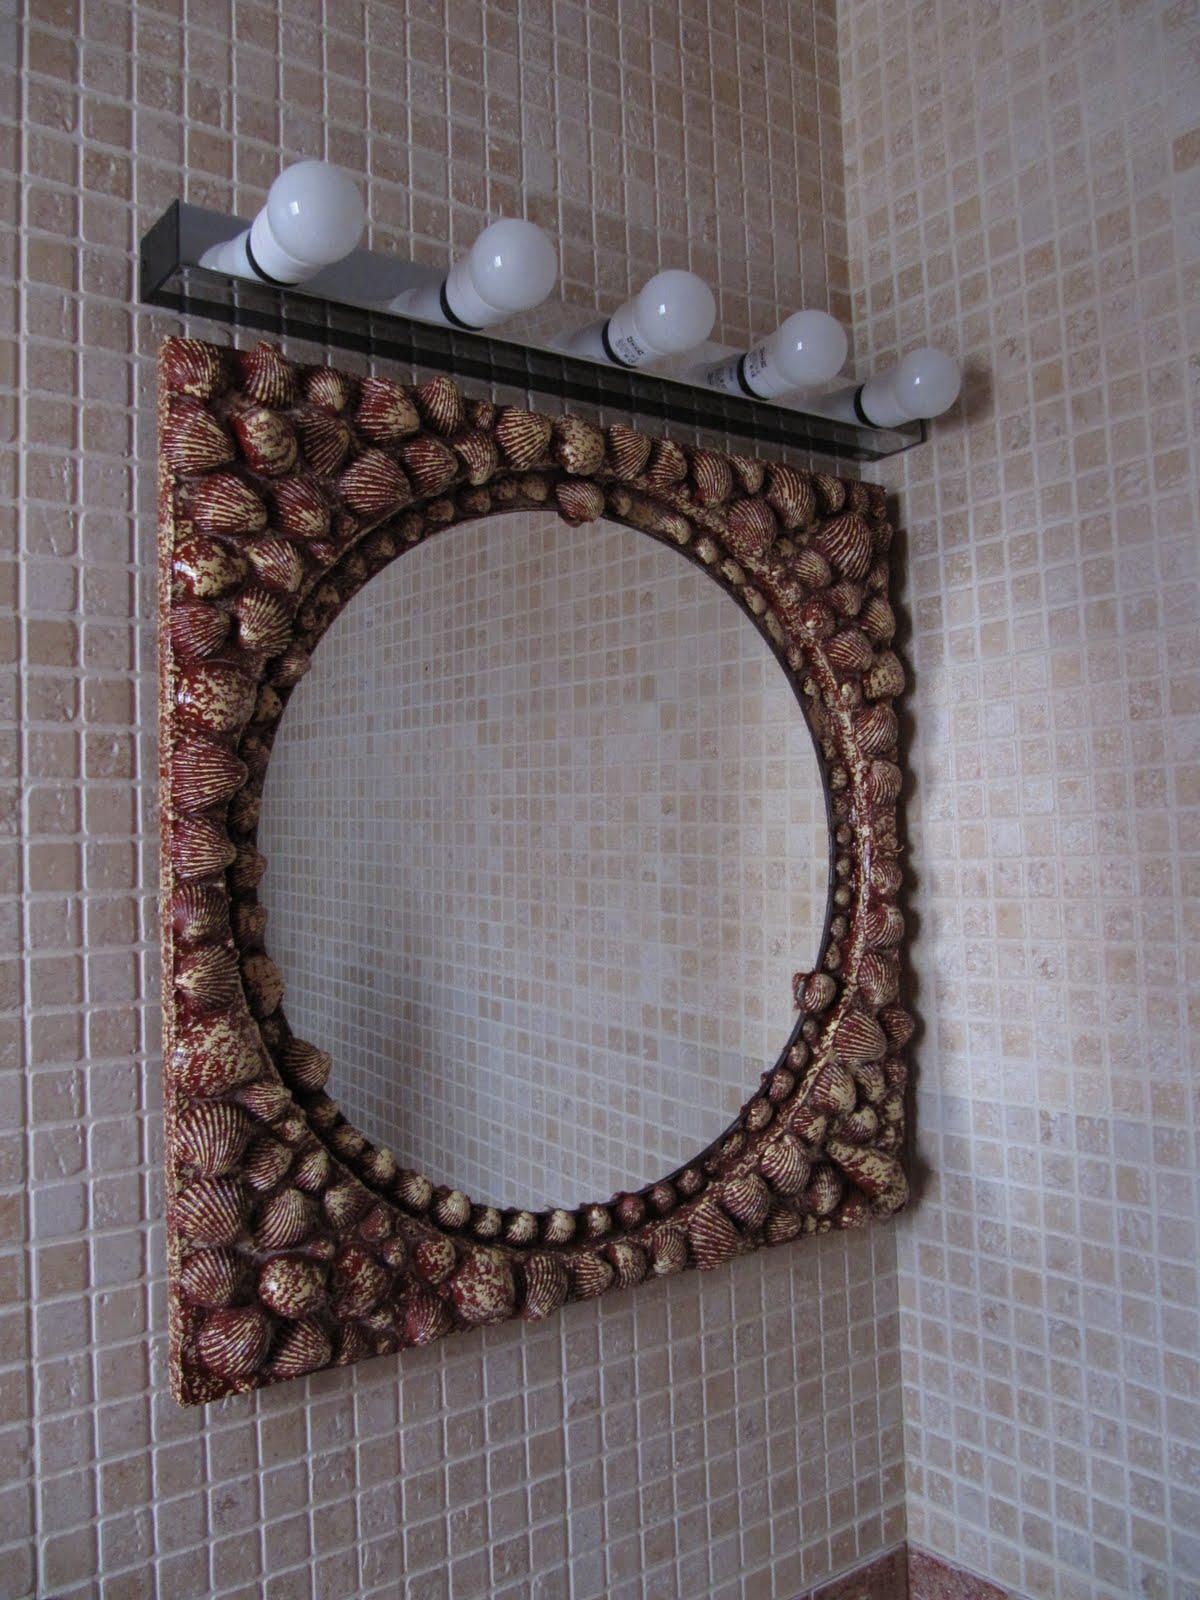 Taller de manualidades: hoy, como reciclar un viejo espejo